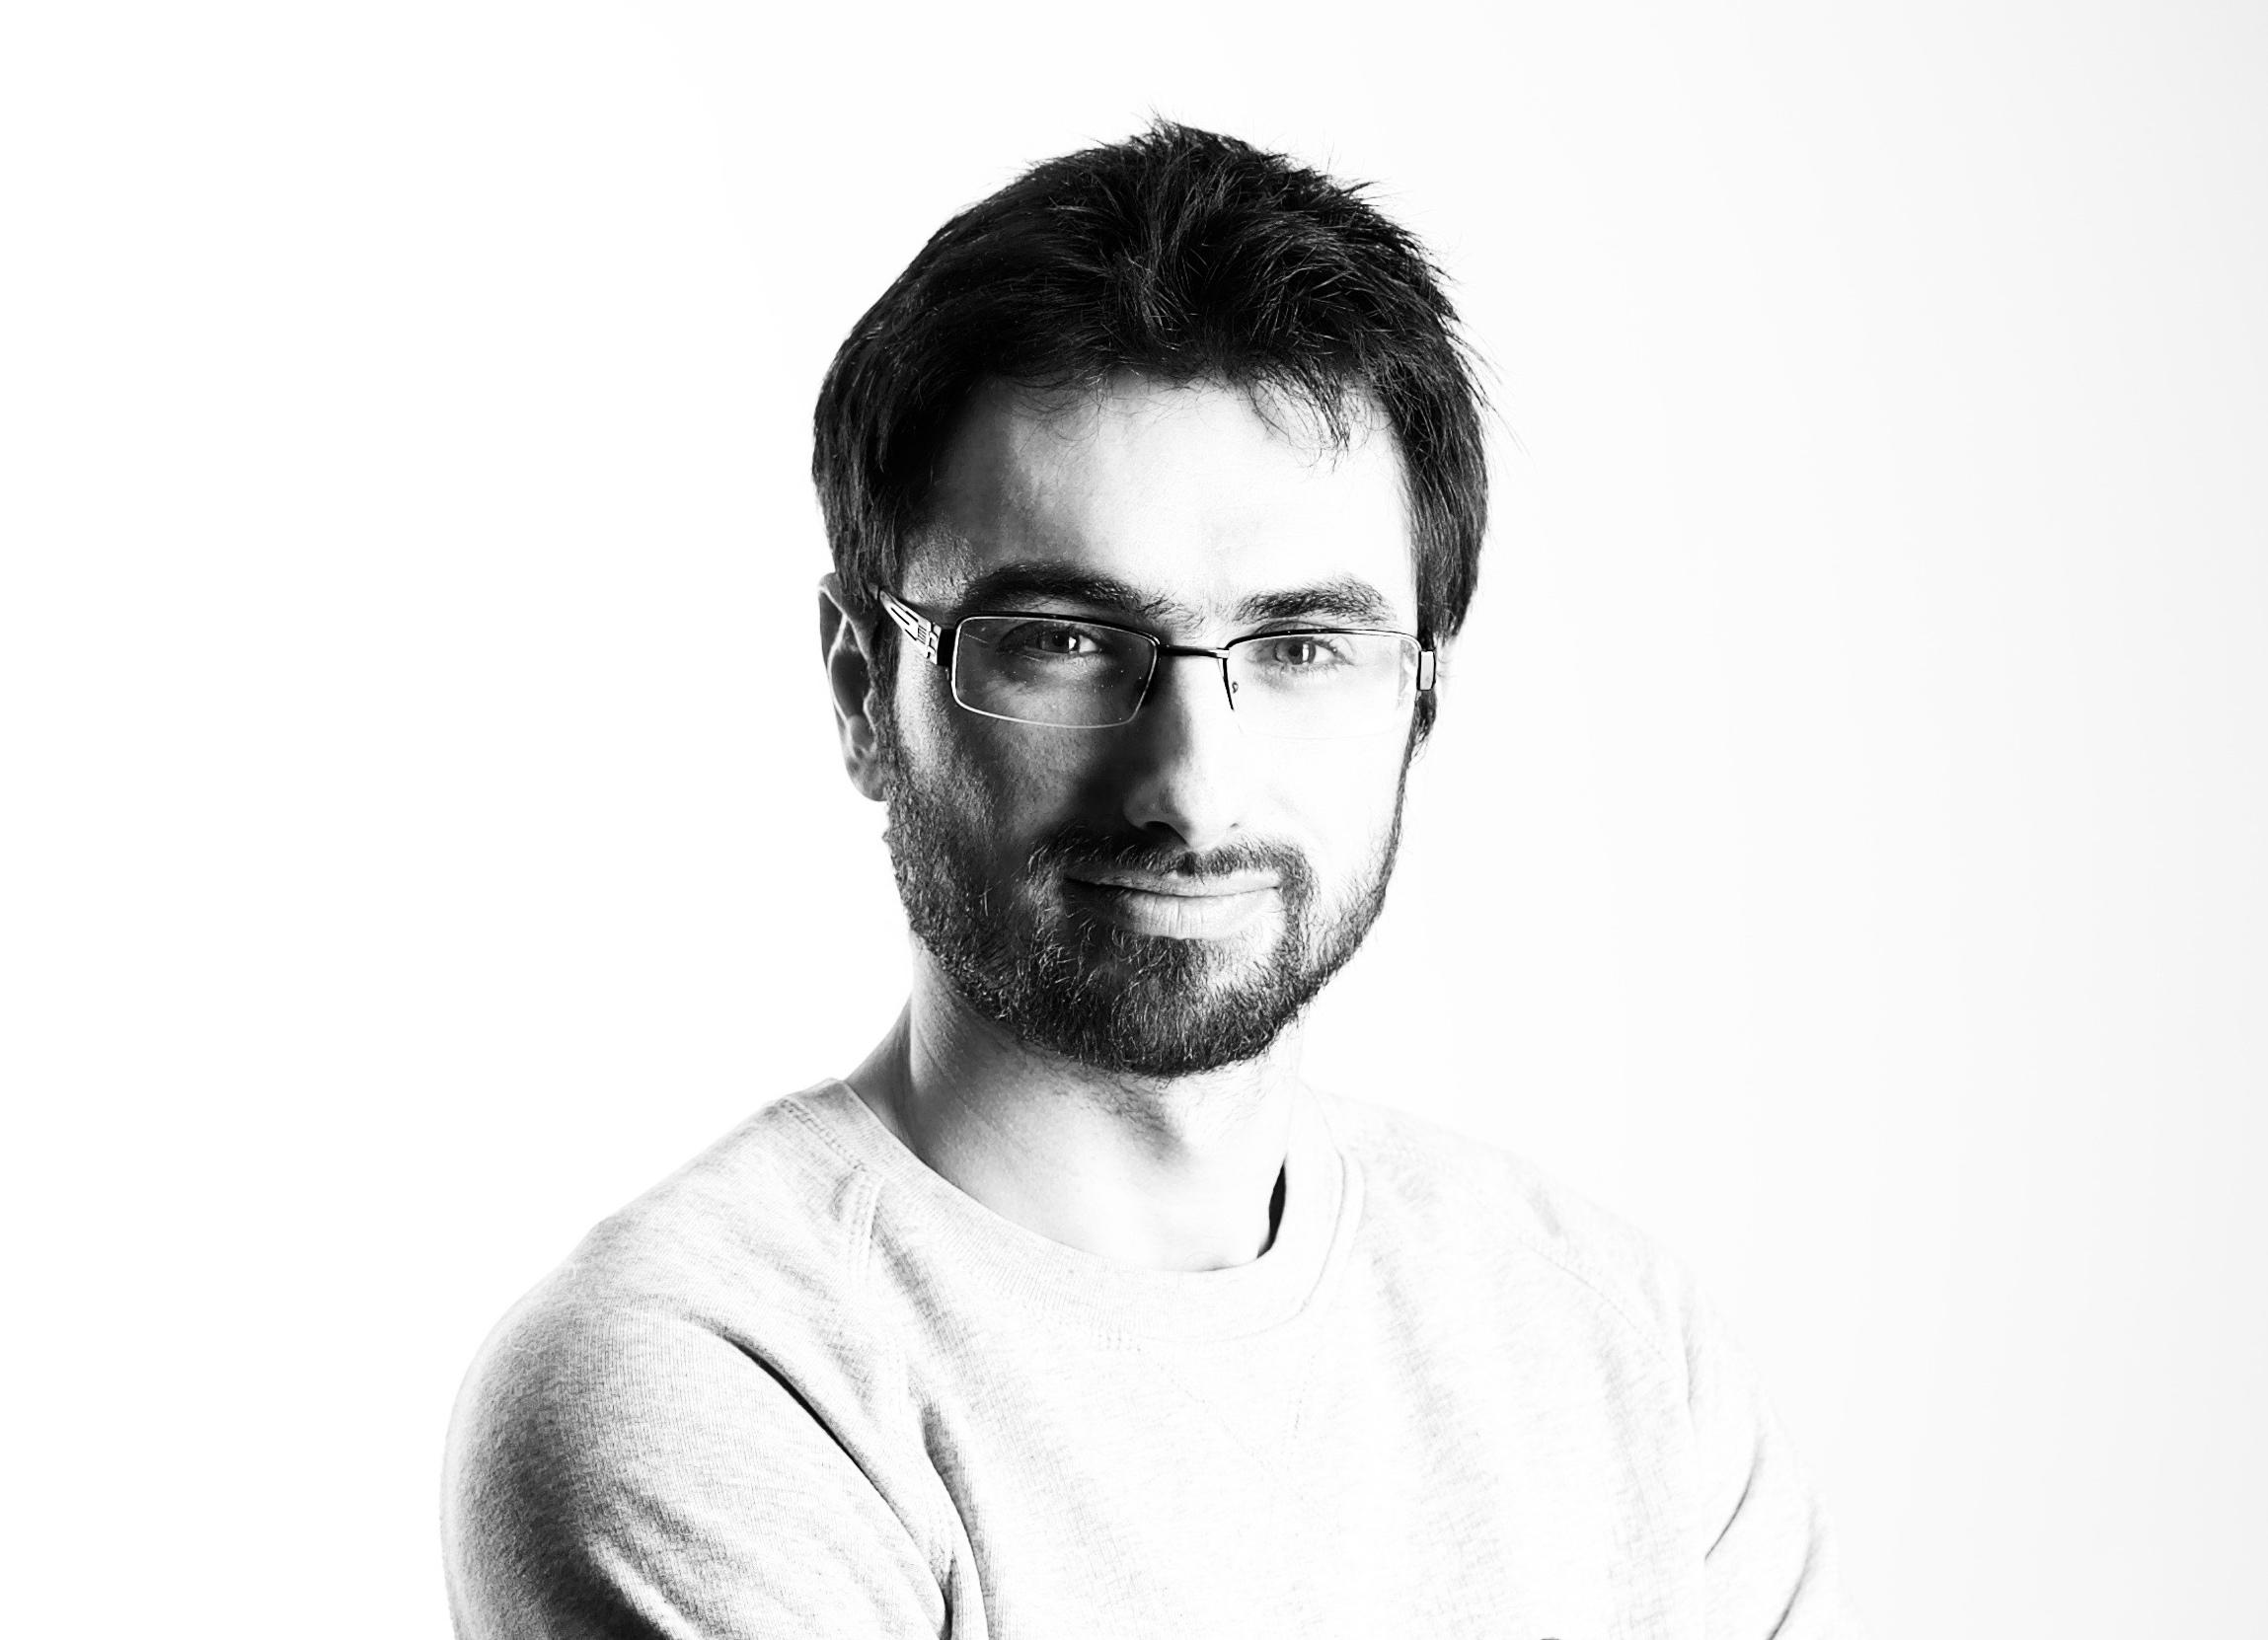 Julien Ramenazi